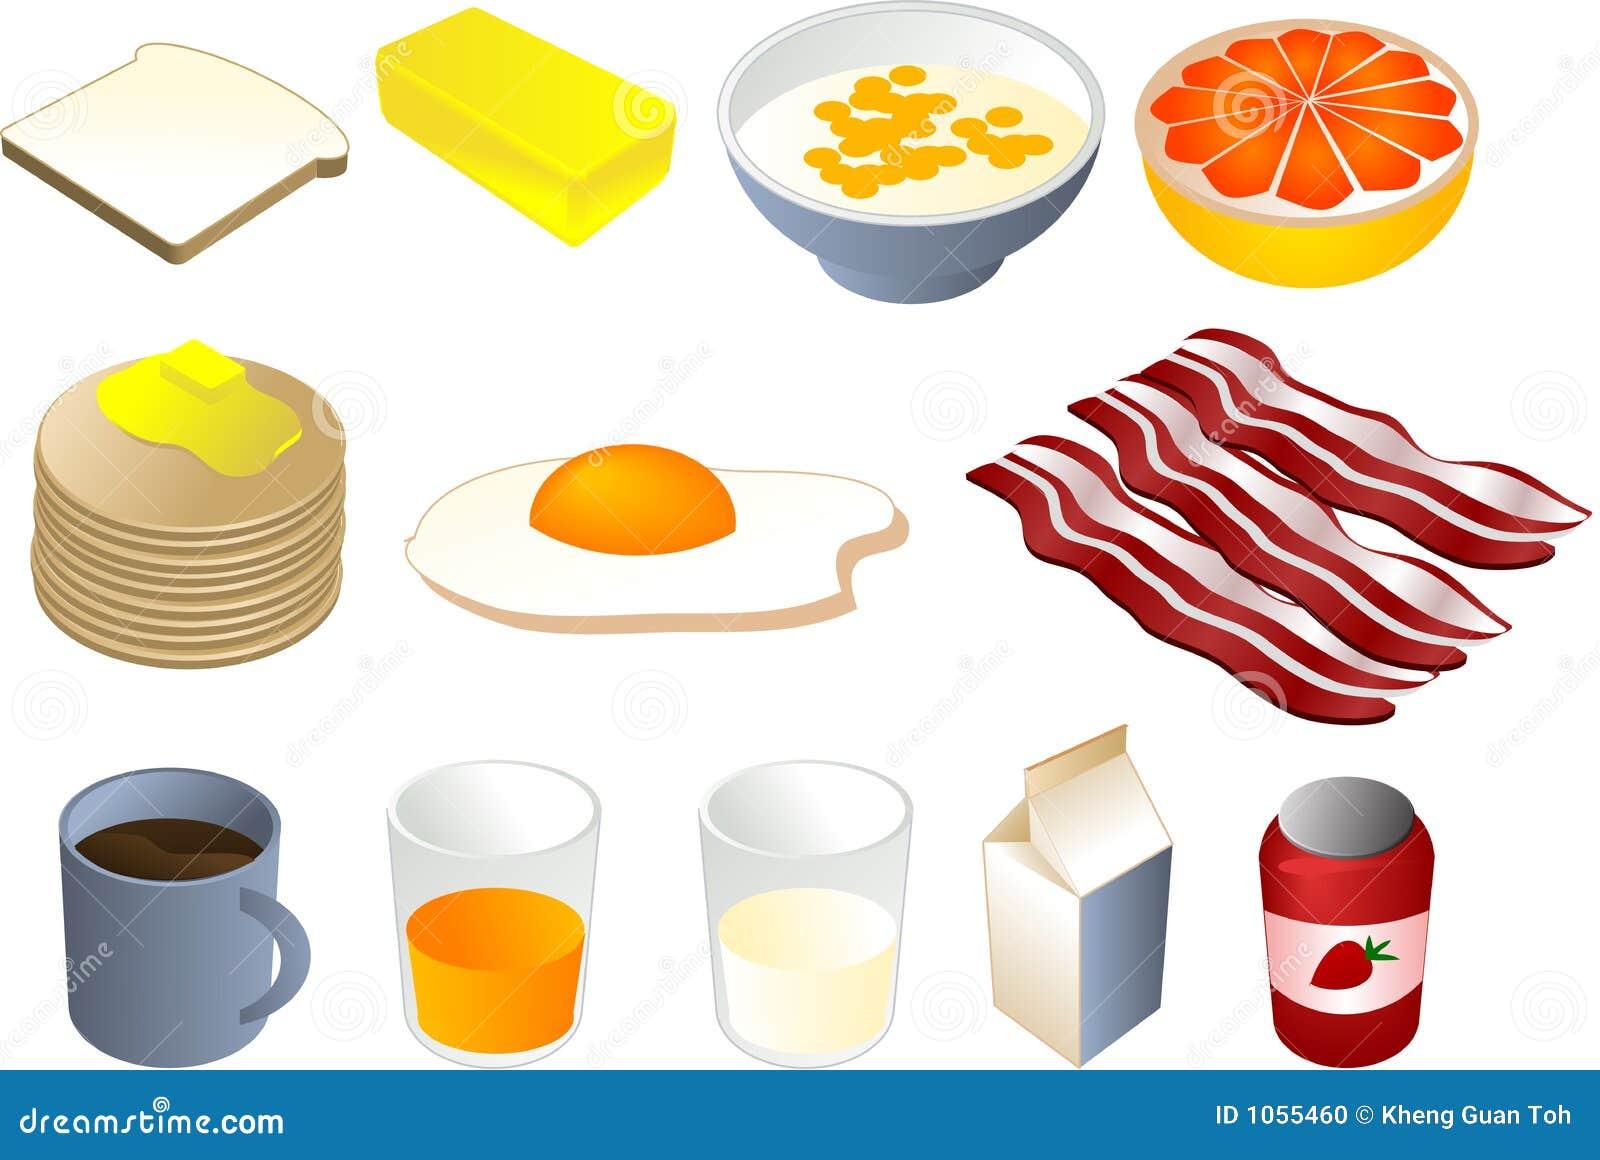 breakfast menu clipart - photo #26